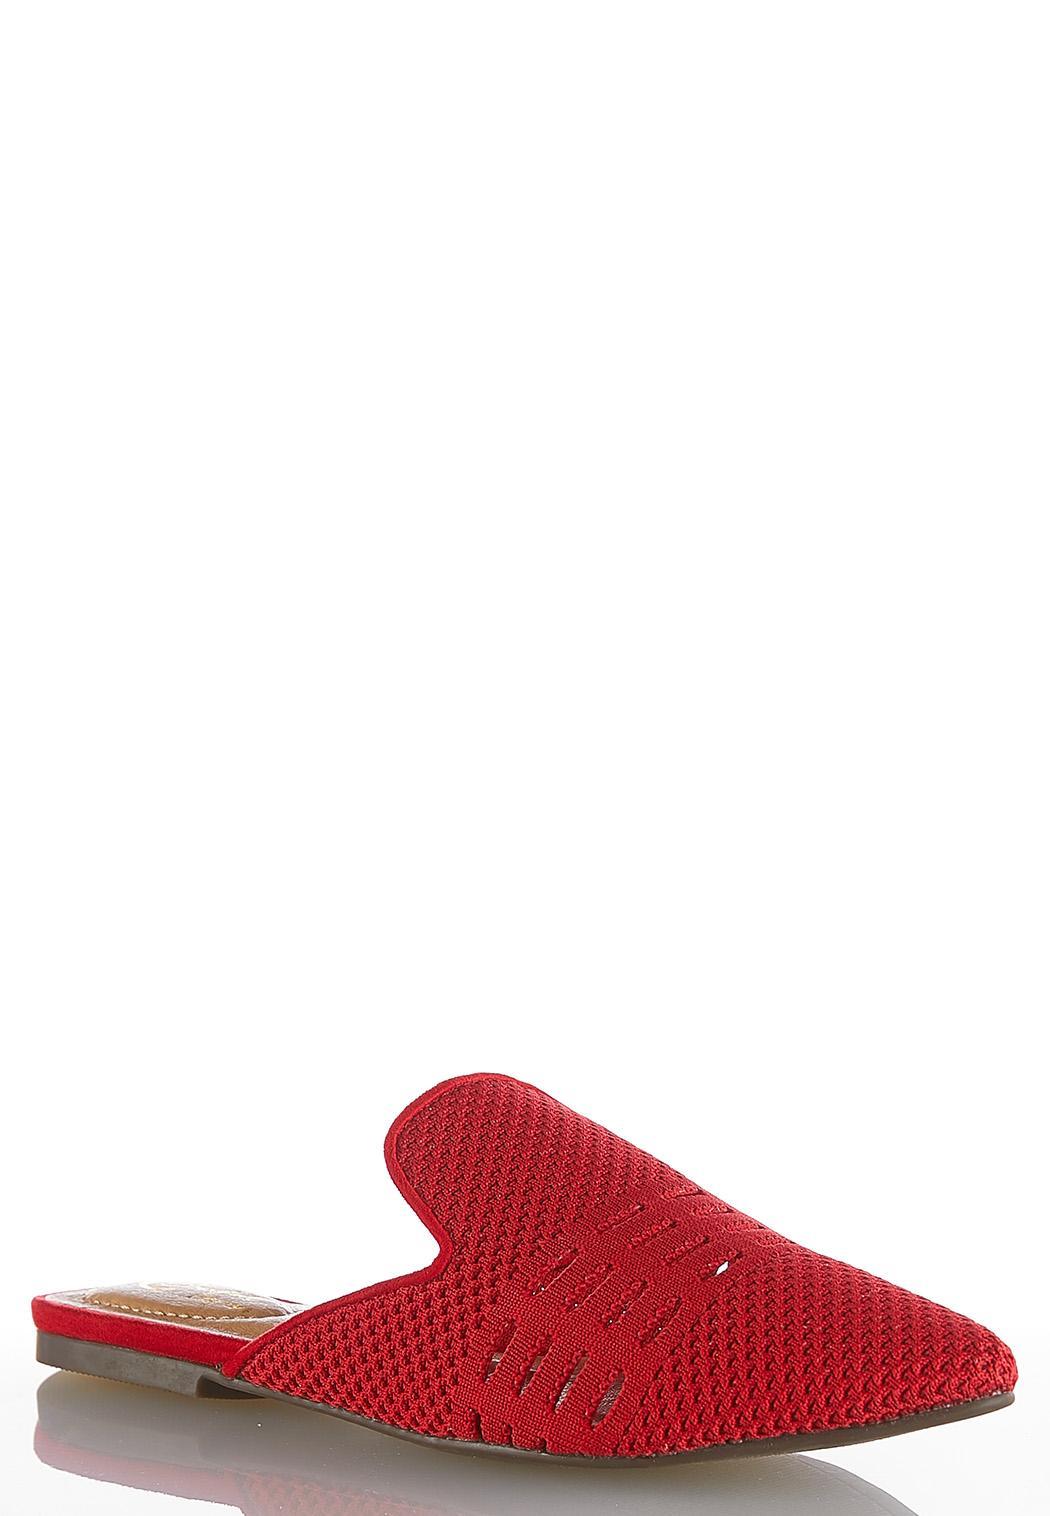 Stretch Knit Slip-On Mules